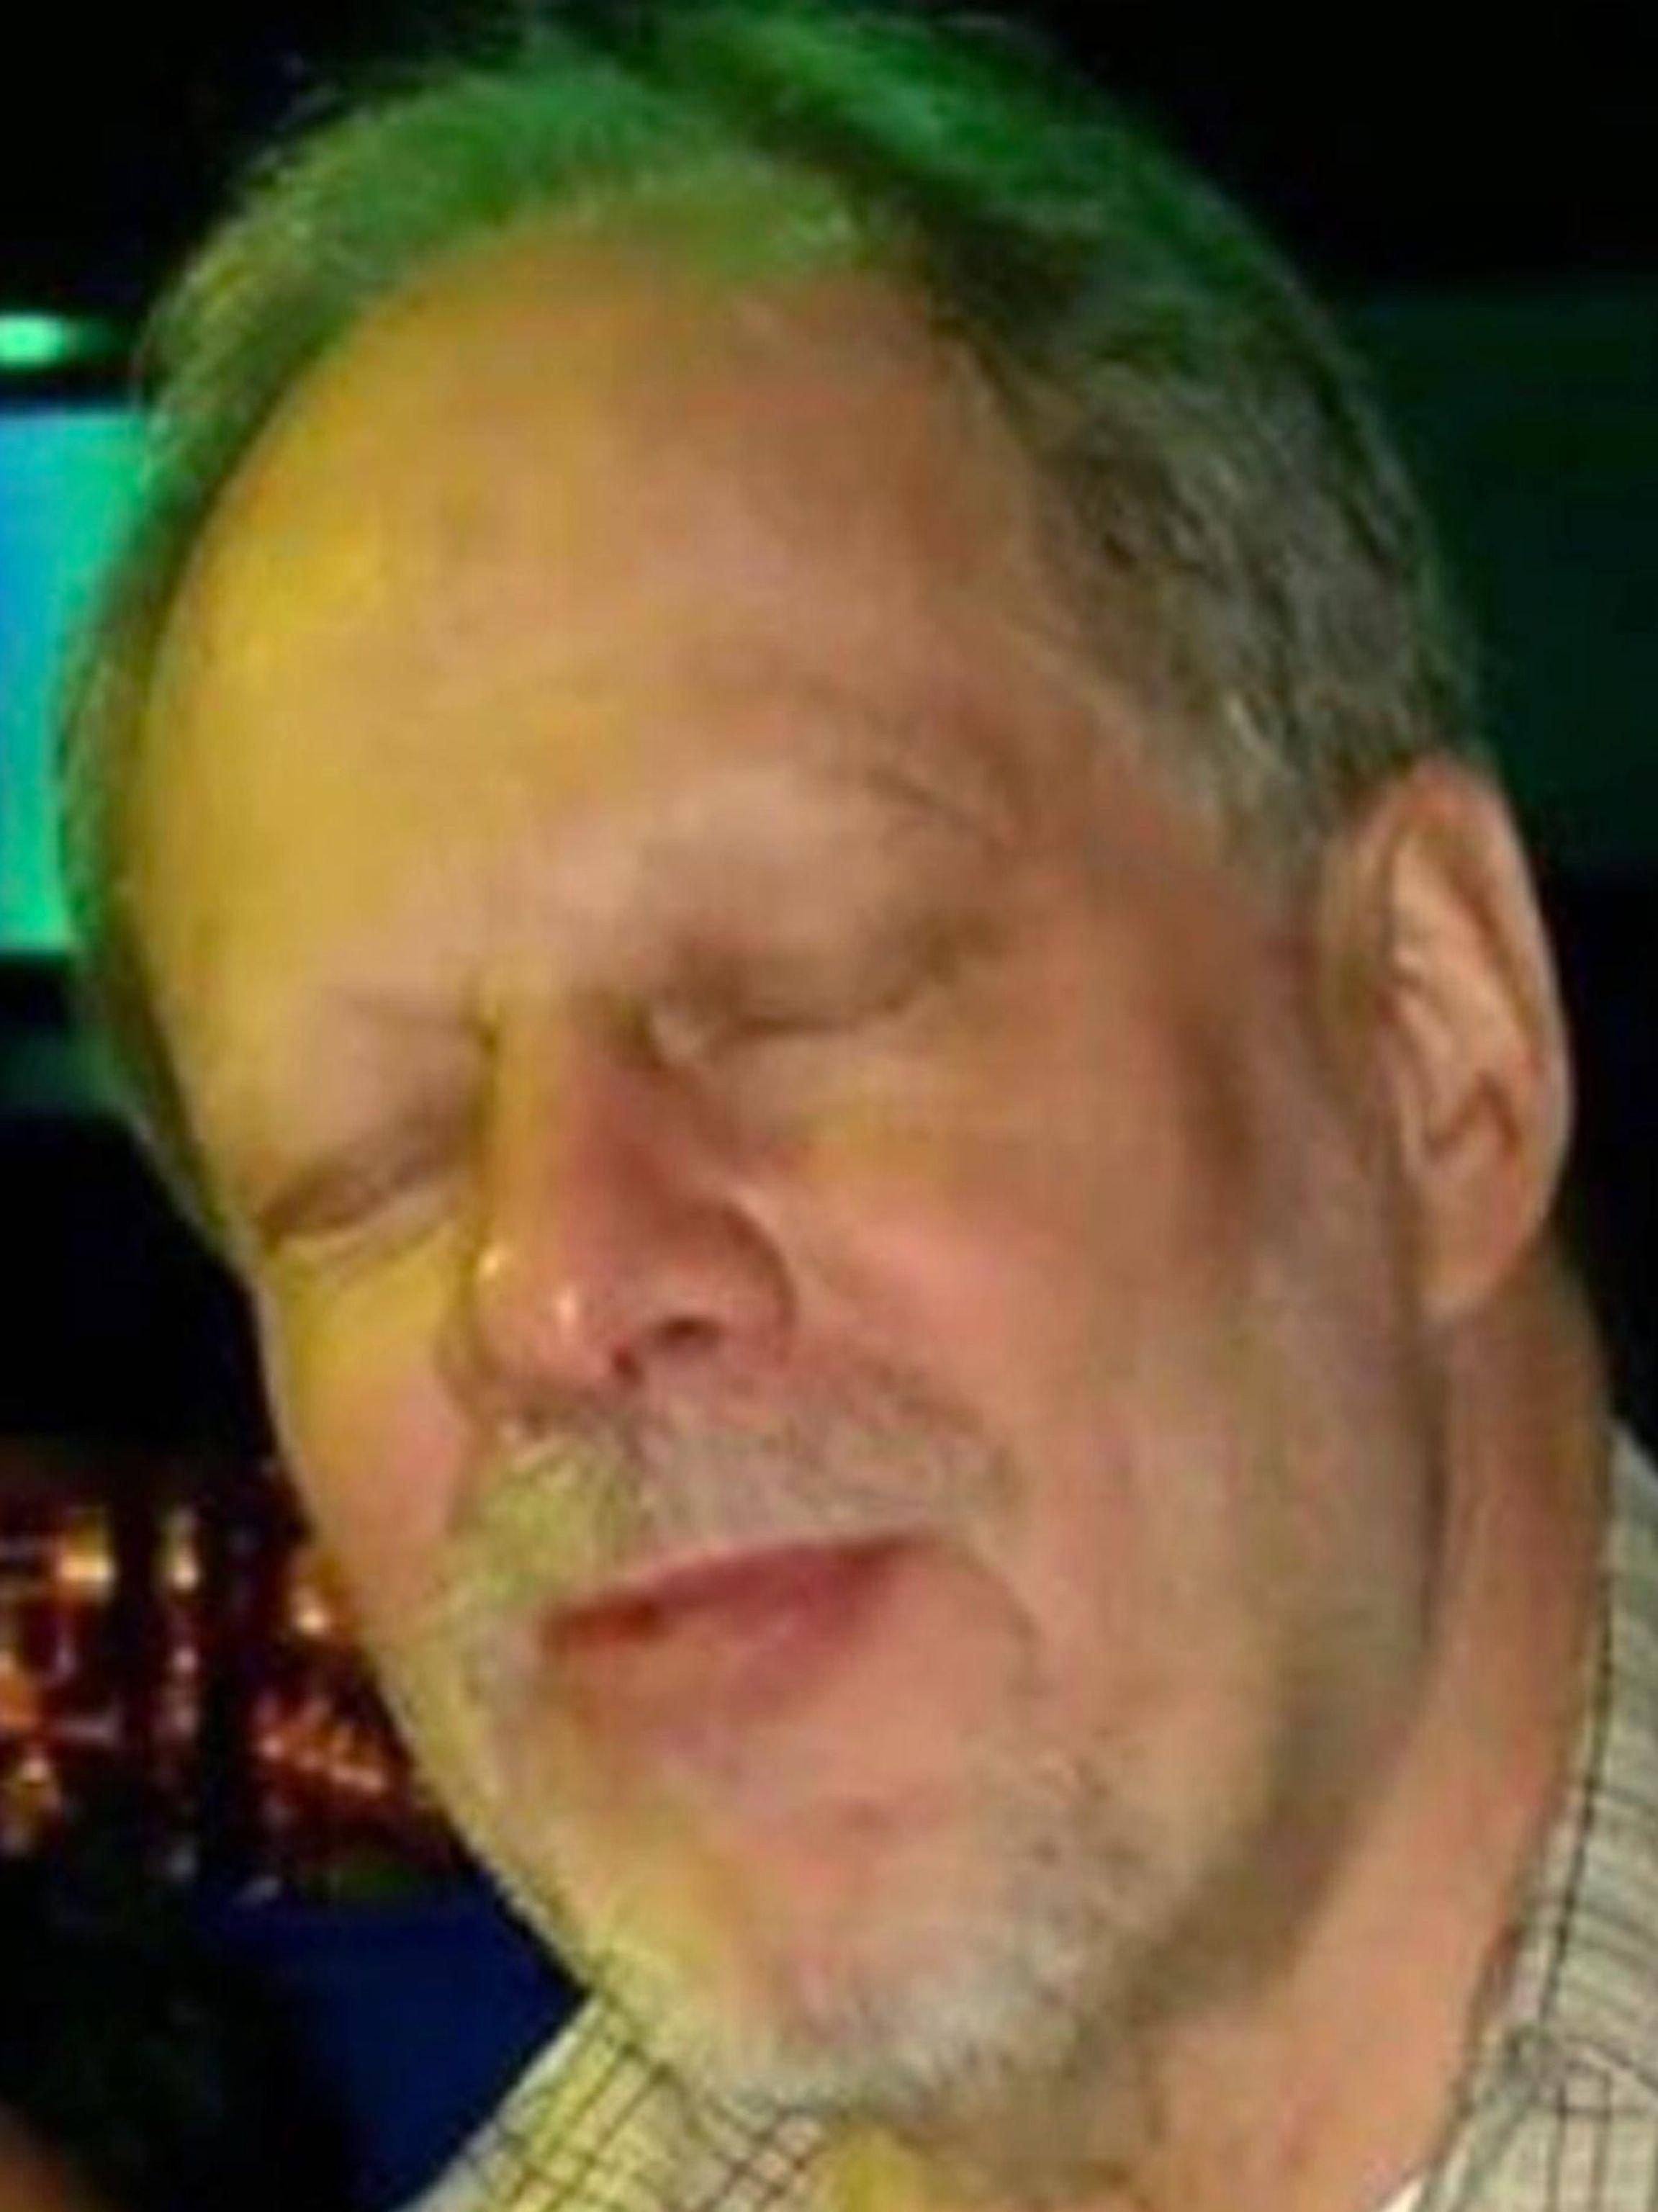 Las Vegas: Stephen Paddock, il killer della strage piu' sanguinosa